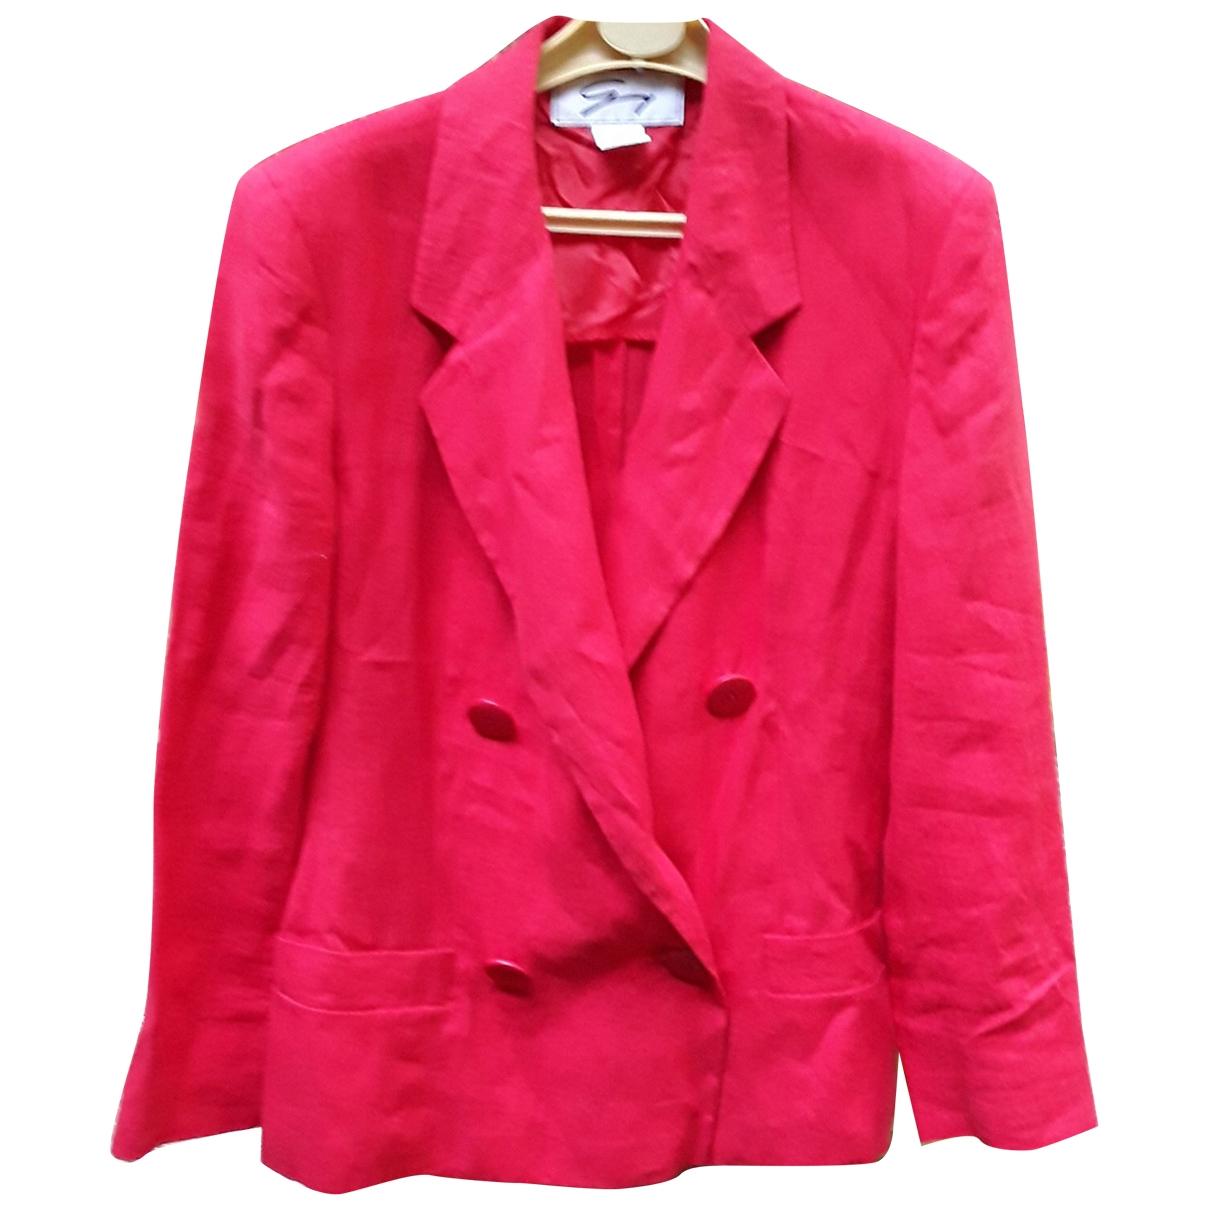 Genny \N Red Linen jacket for Women 42 FR